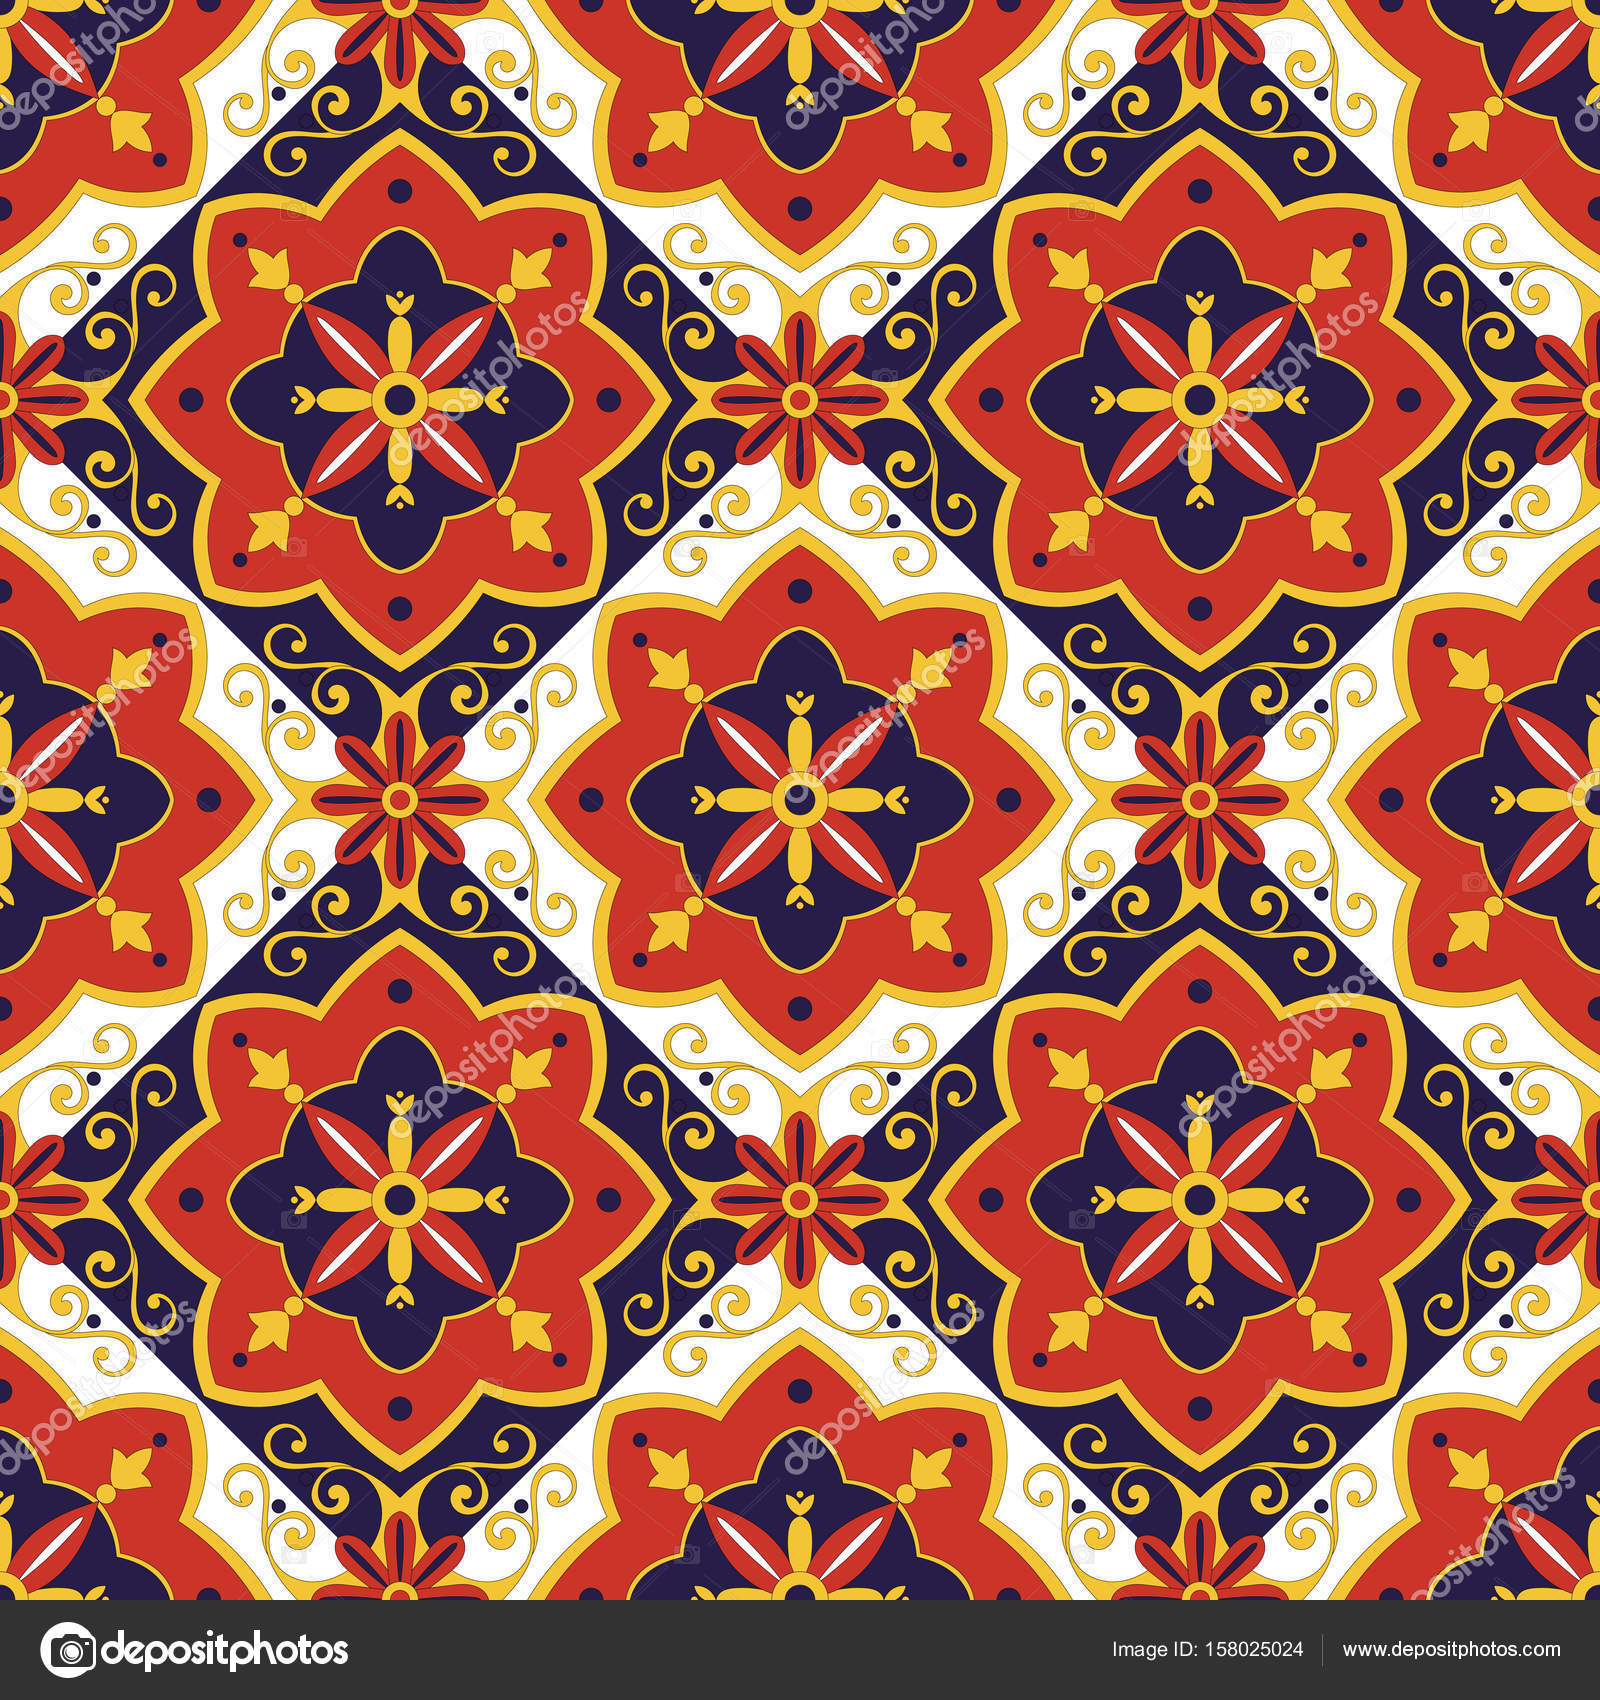 Italienische Fliesen Muster Vektor Mit Diagonalen Blauen Roten